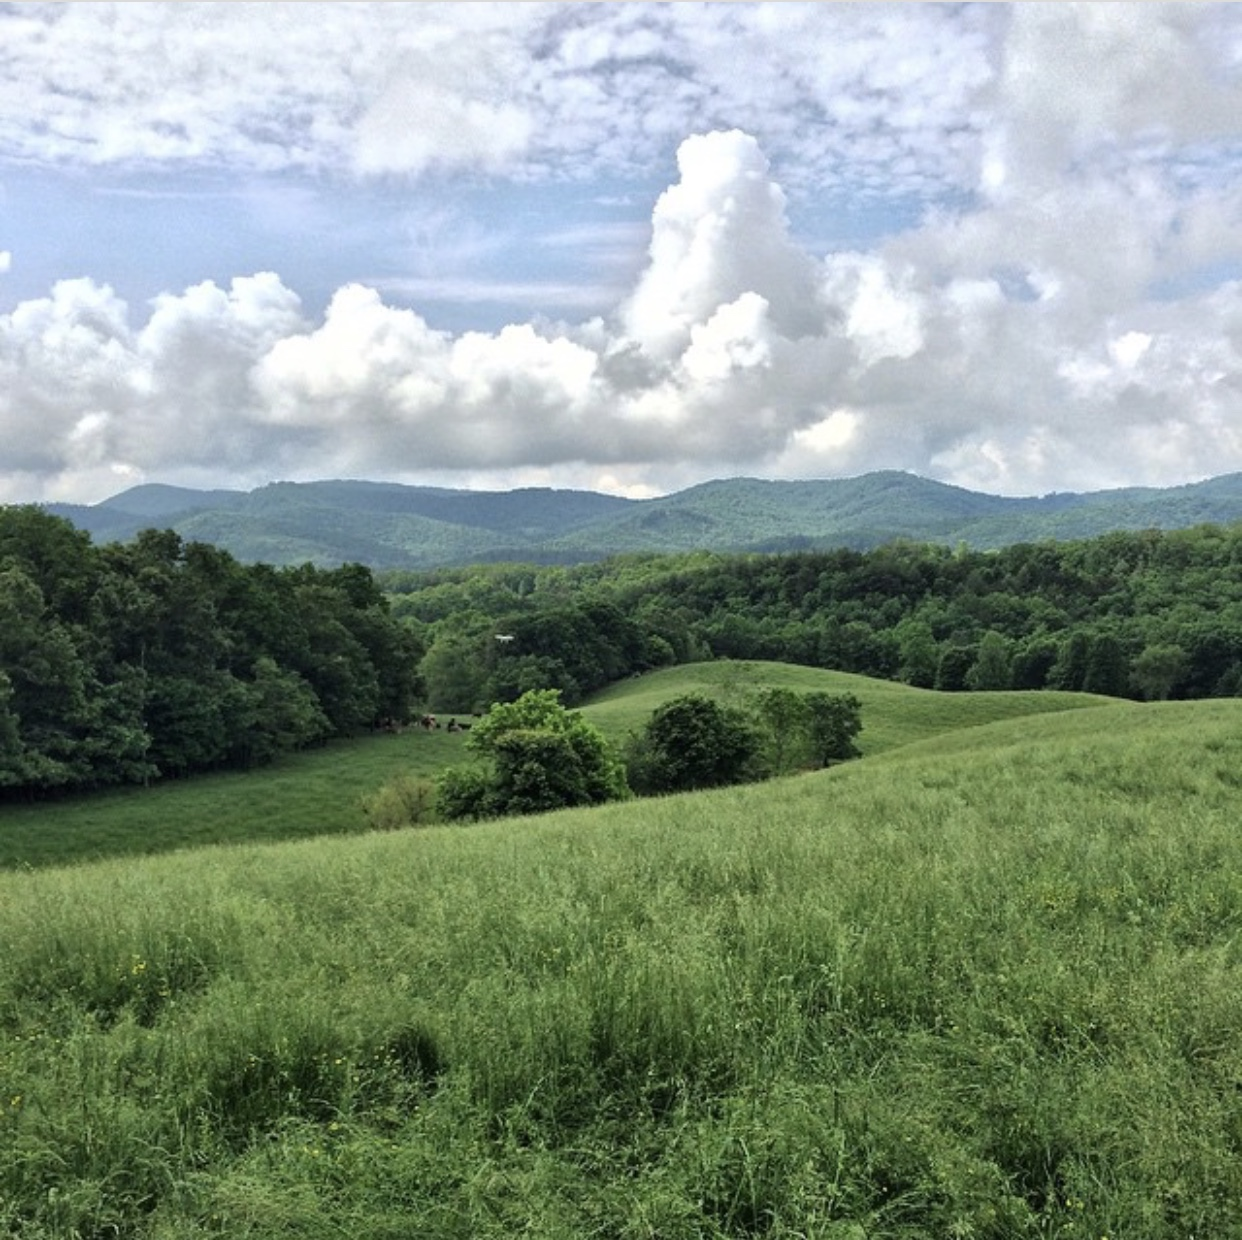 Ridgefield Farms, Brasstown, NC - Steve Whitmire